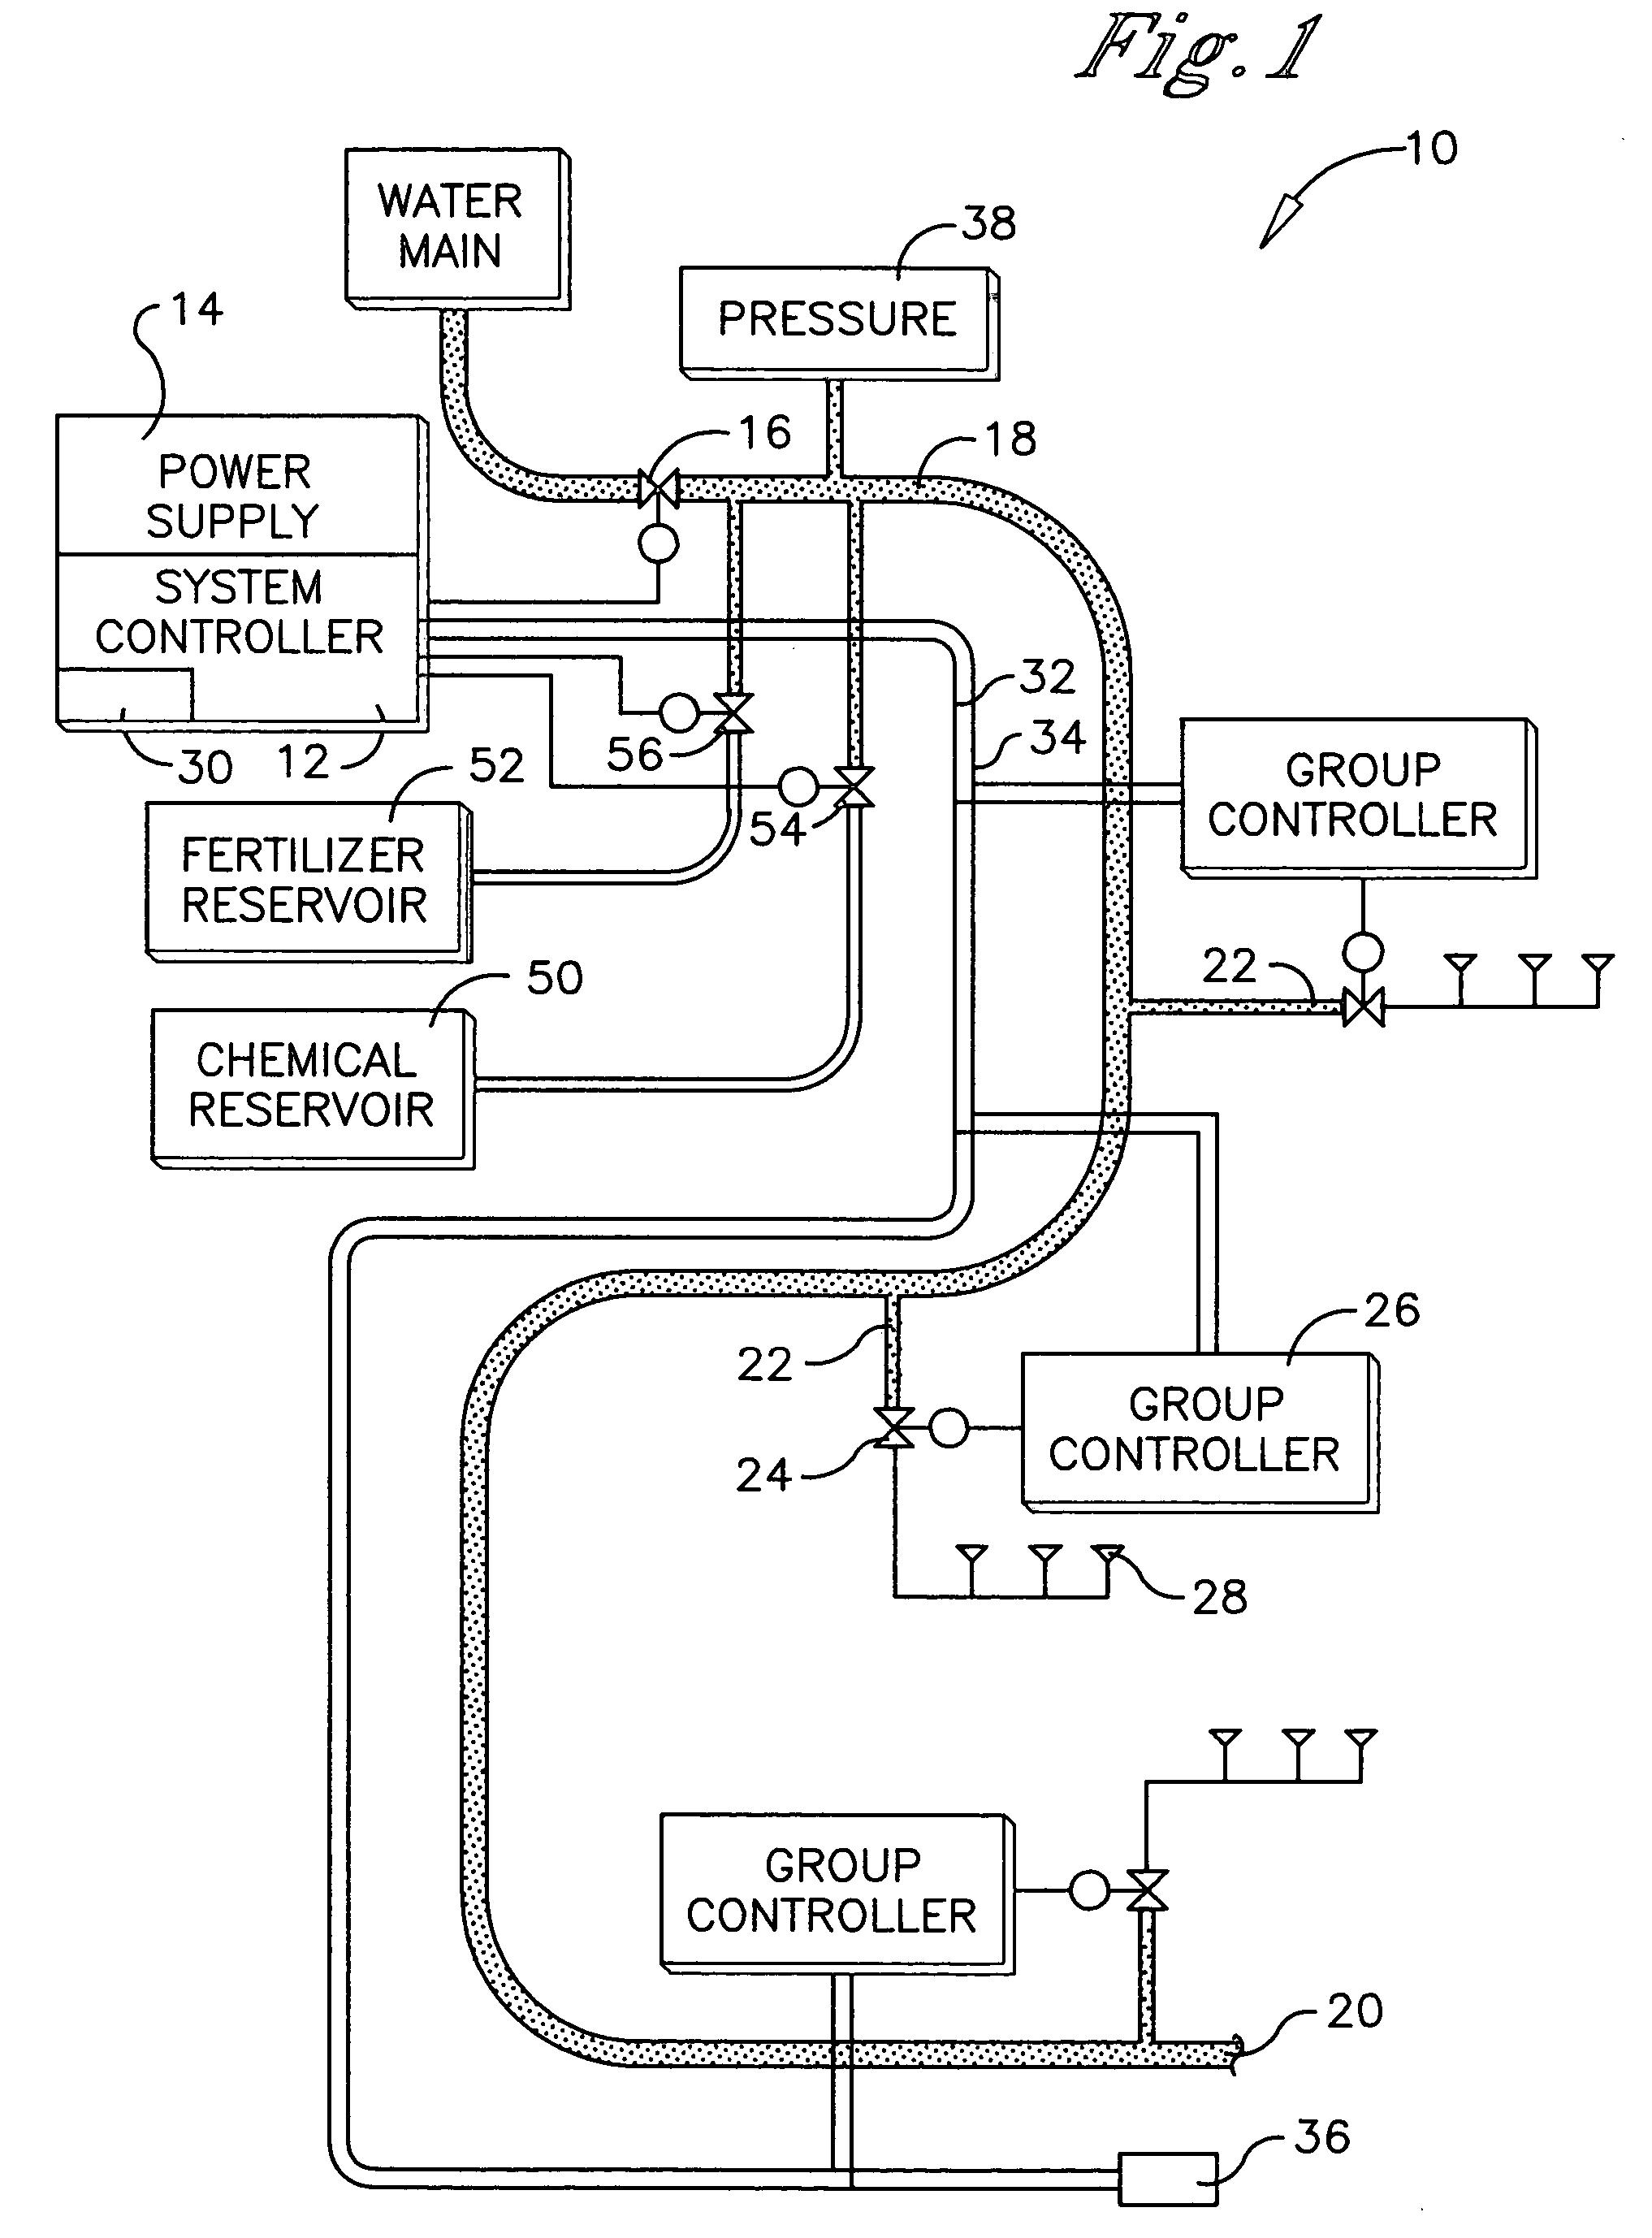 Semasi Car Smps Devre Semasi Xpx Making Car Amplifier Smps With Tl494